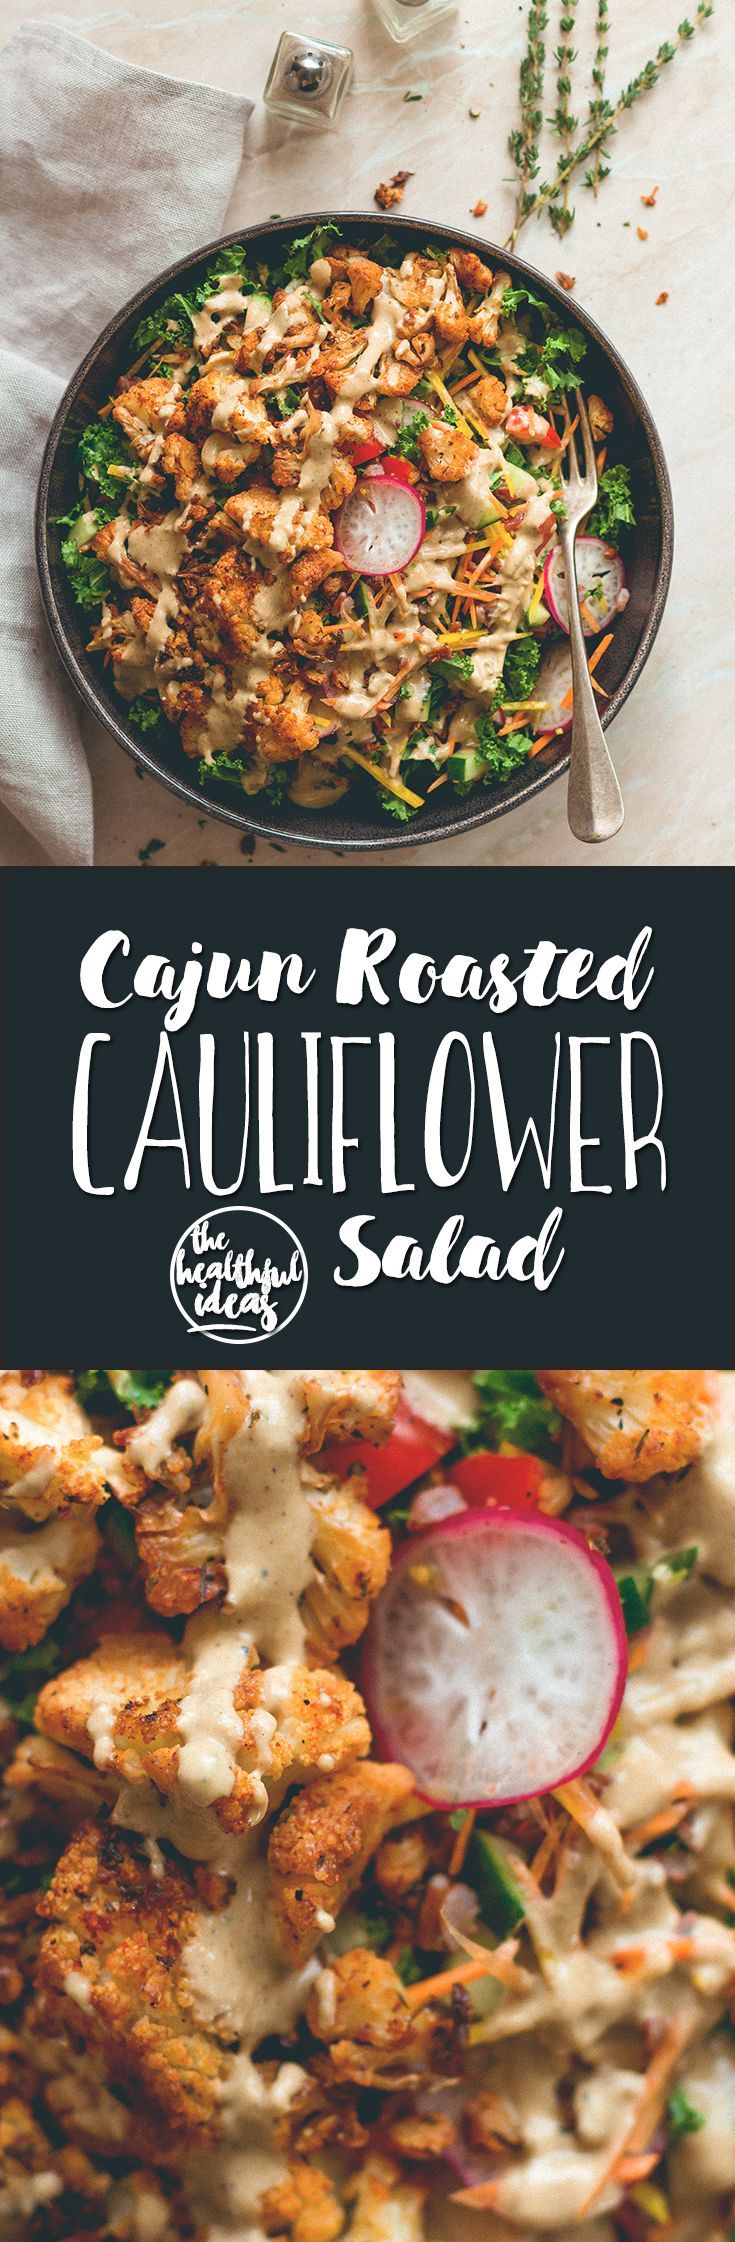 Cajun Roasted Cauliflower Salad - I love cajun seasoning on roasted fall vegetables. This salad is perfect for this time of the year. Cauliflower, mixed salad, and tahini dressing. (vegan, GF) | http://thehealthfulideas.com